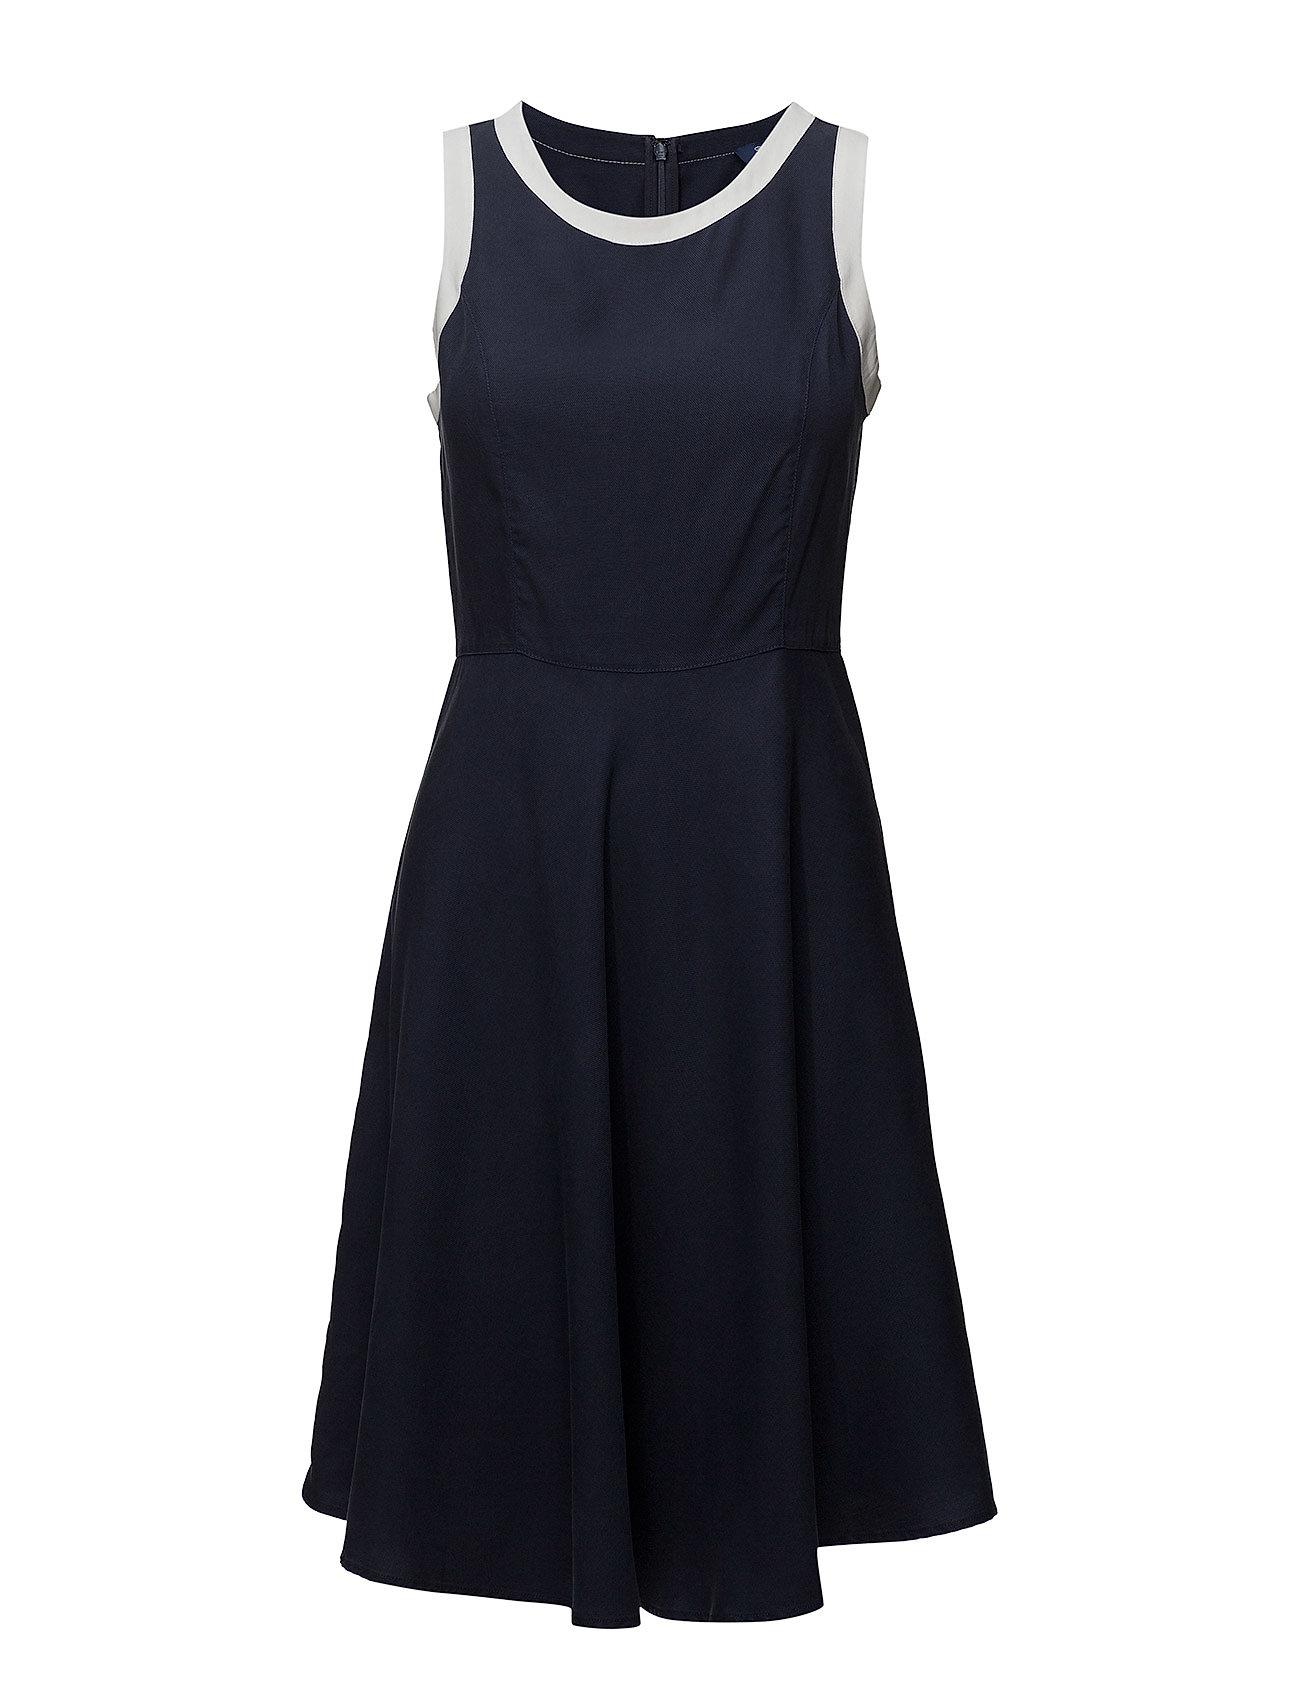 GANT Op1. Pique Lyocell Dress Kleid Knielang Blau GANT